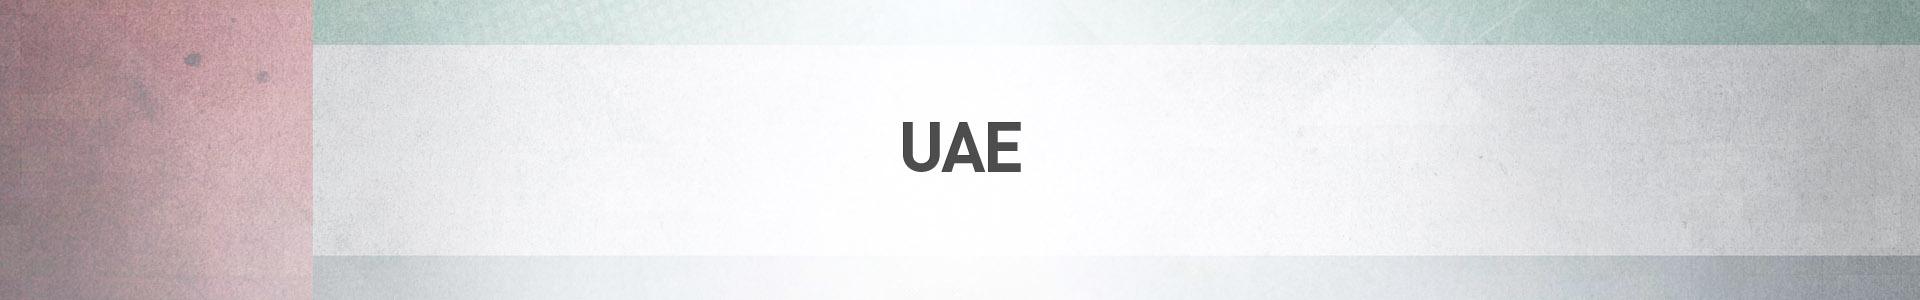 Topo-Pais-UAE-SBA